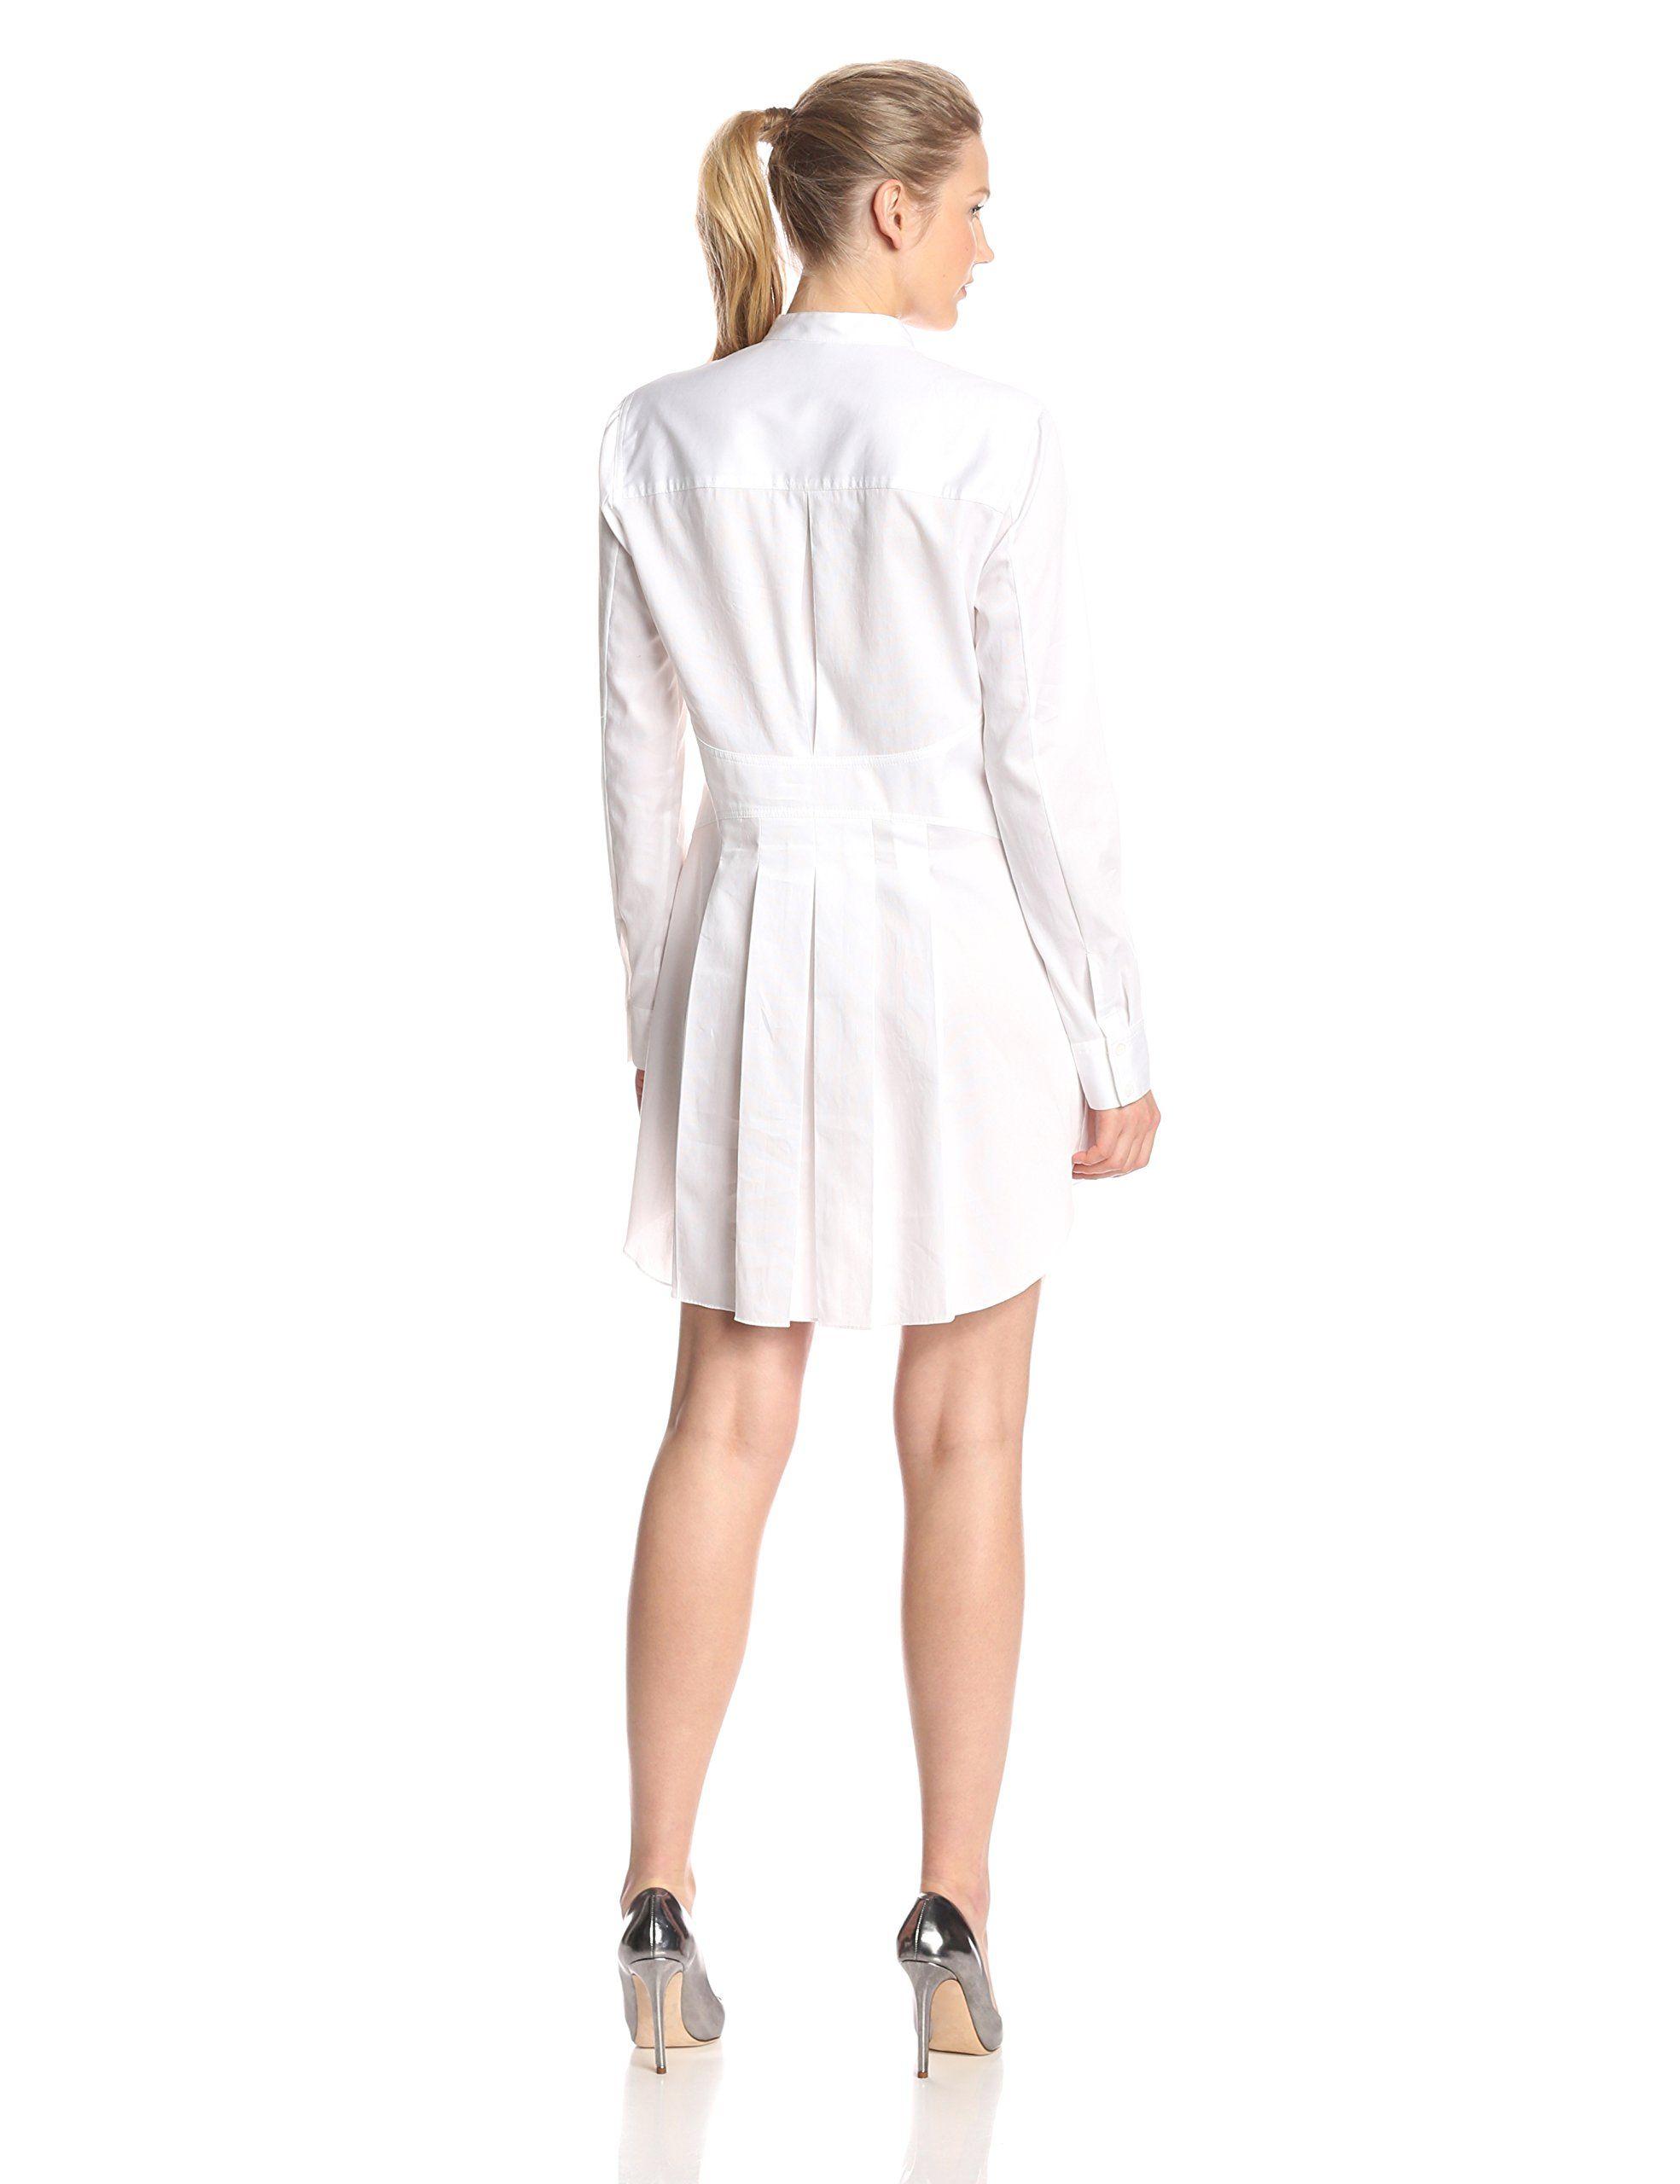 super service purchase cheap famous designer brand Amazon.com: BCBGMAXAZRIA Women's Casie Tuxedo-Shirt Dress ...